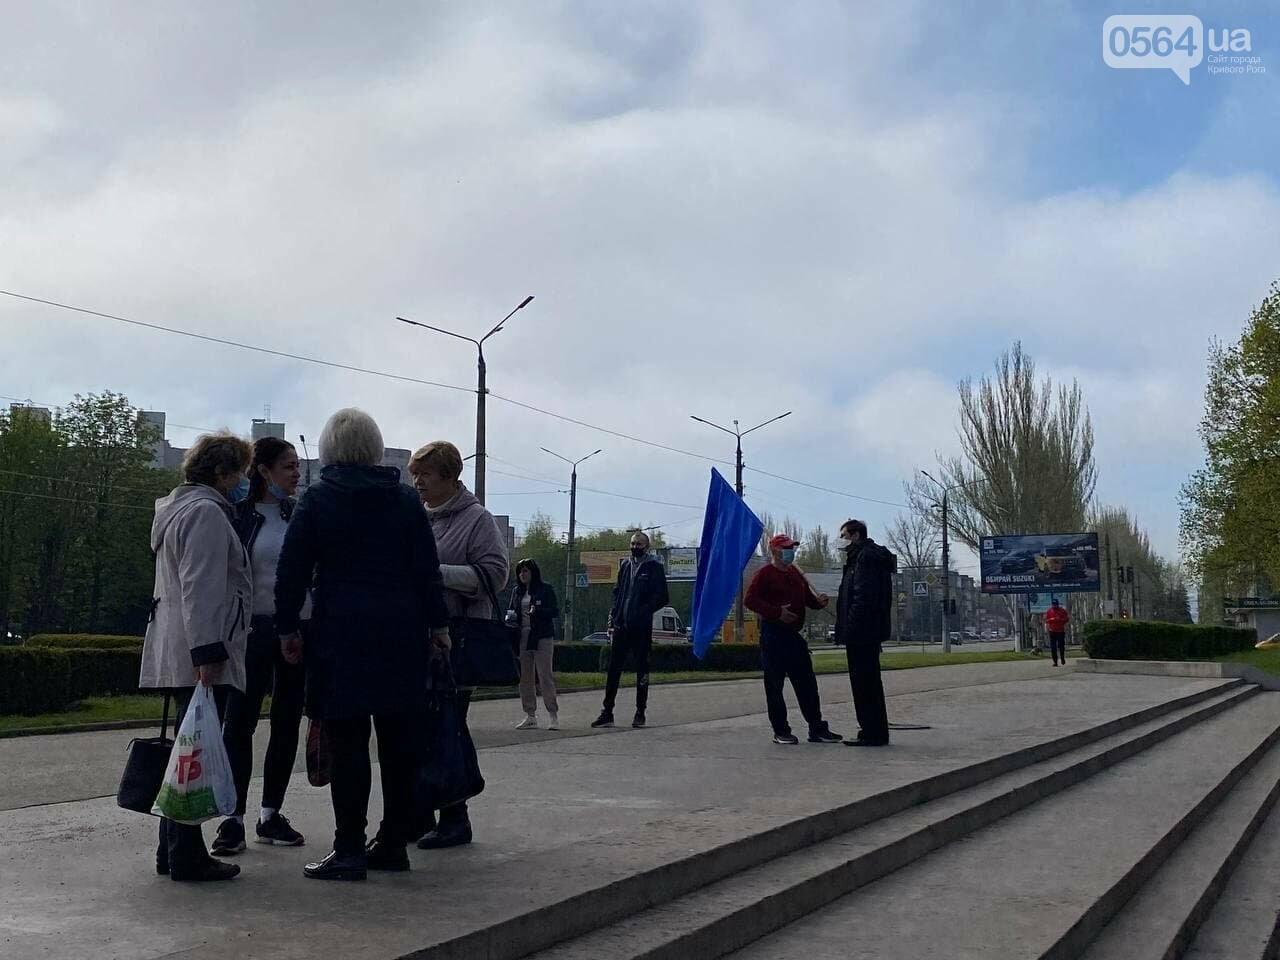 """Мир! Труд! Май!"", ""Зарплату 1000 евро!"", - криворожане вышли на первомайский марш, - ФОТО, ВИДЕО , фото-8"